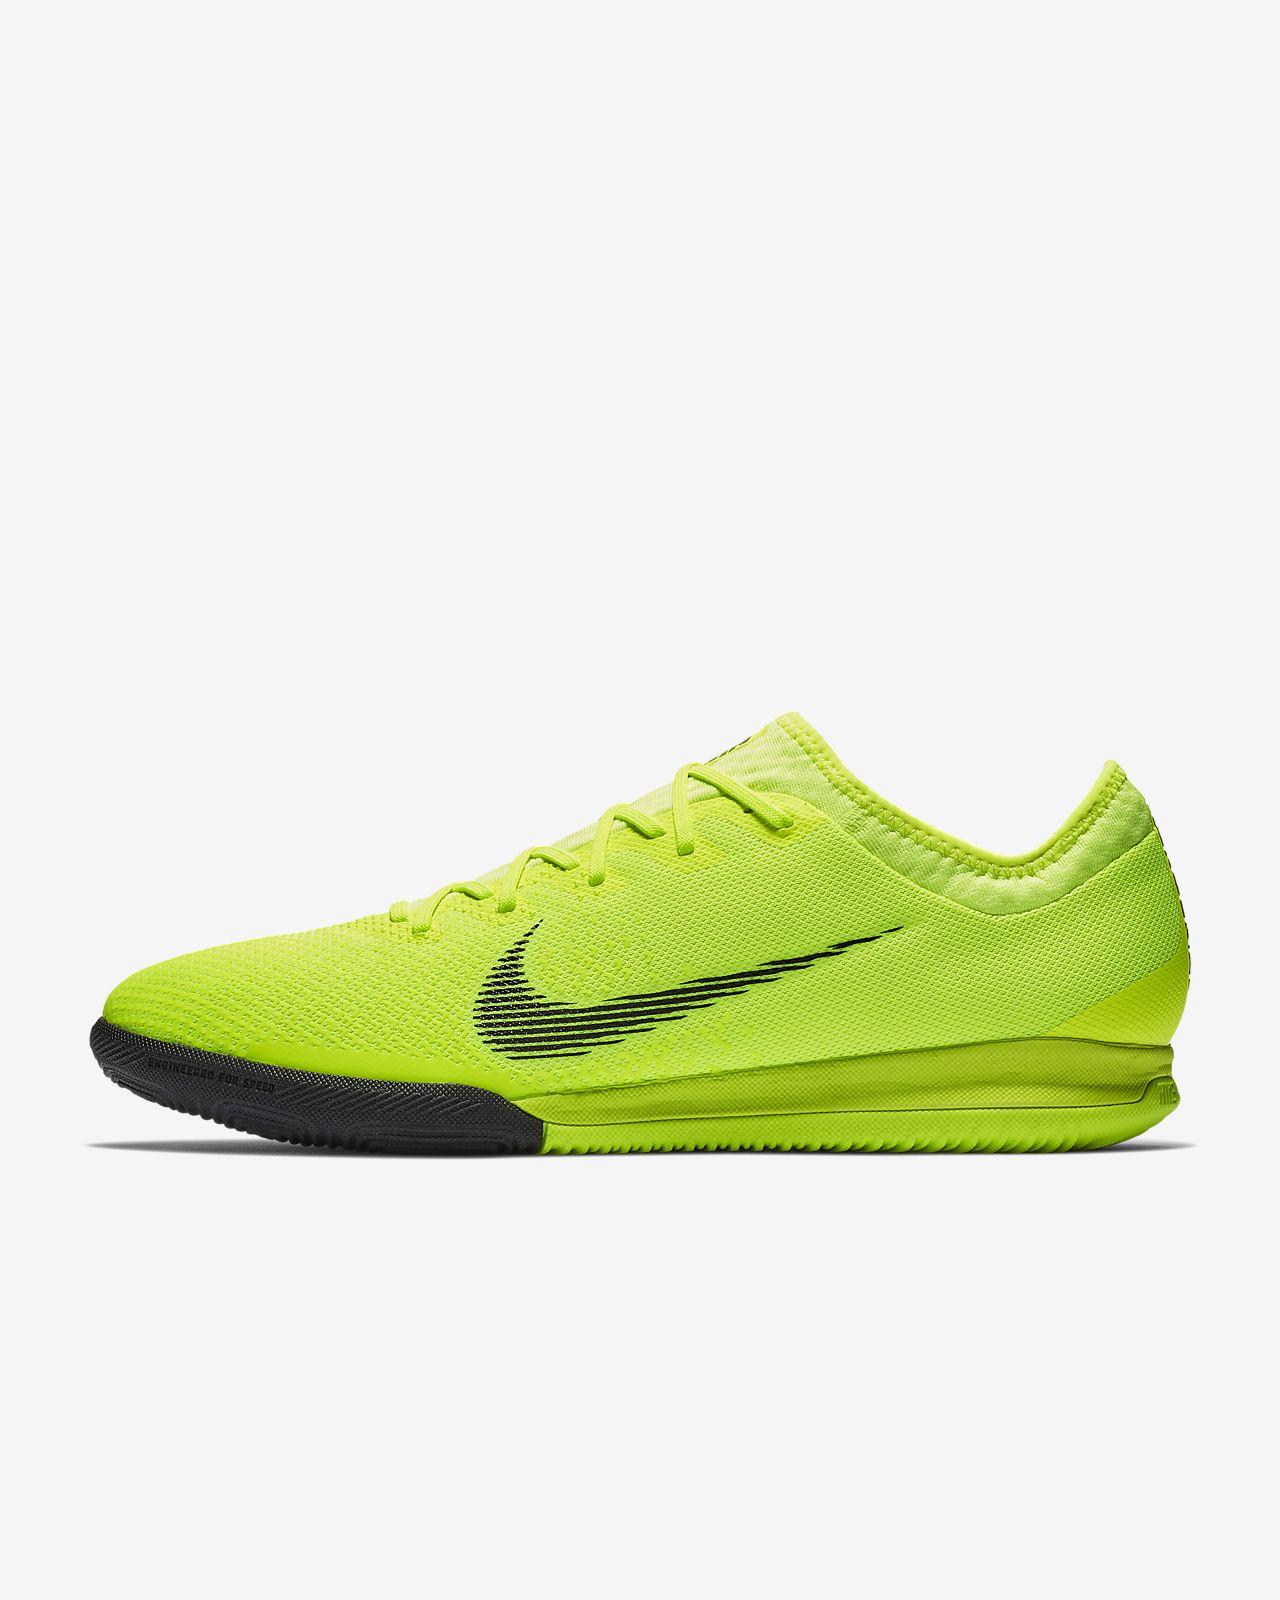 Xii Nike Mercurialx Pro Salle Football De En Vapor Chaussure TWIa0q8X